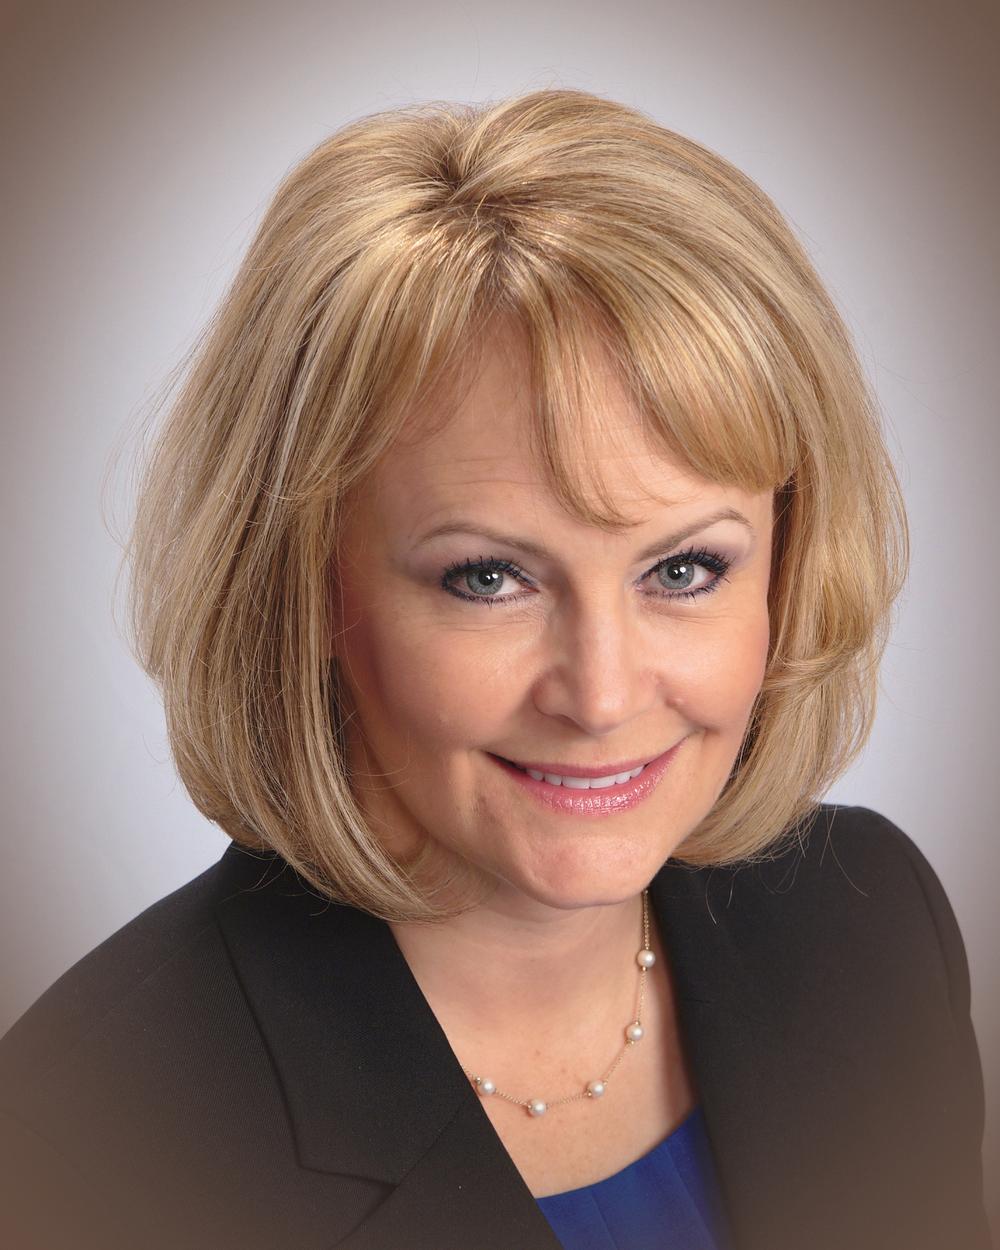 Julie Door for Puyallup City Council District 3, Position 2